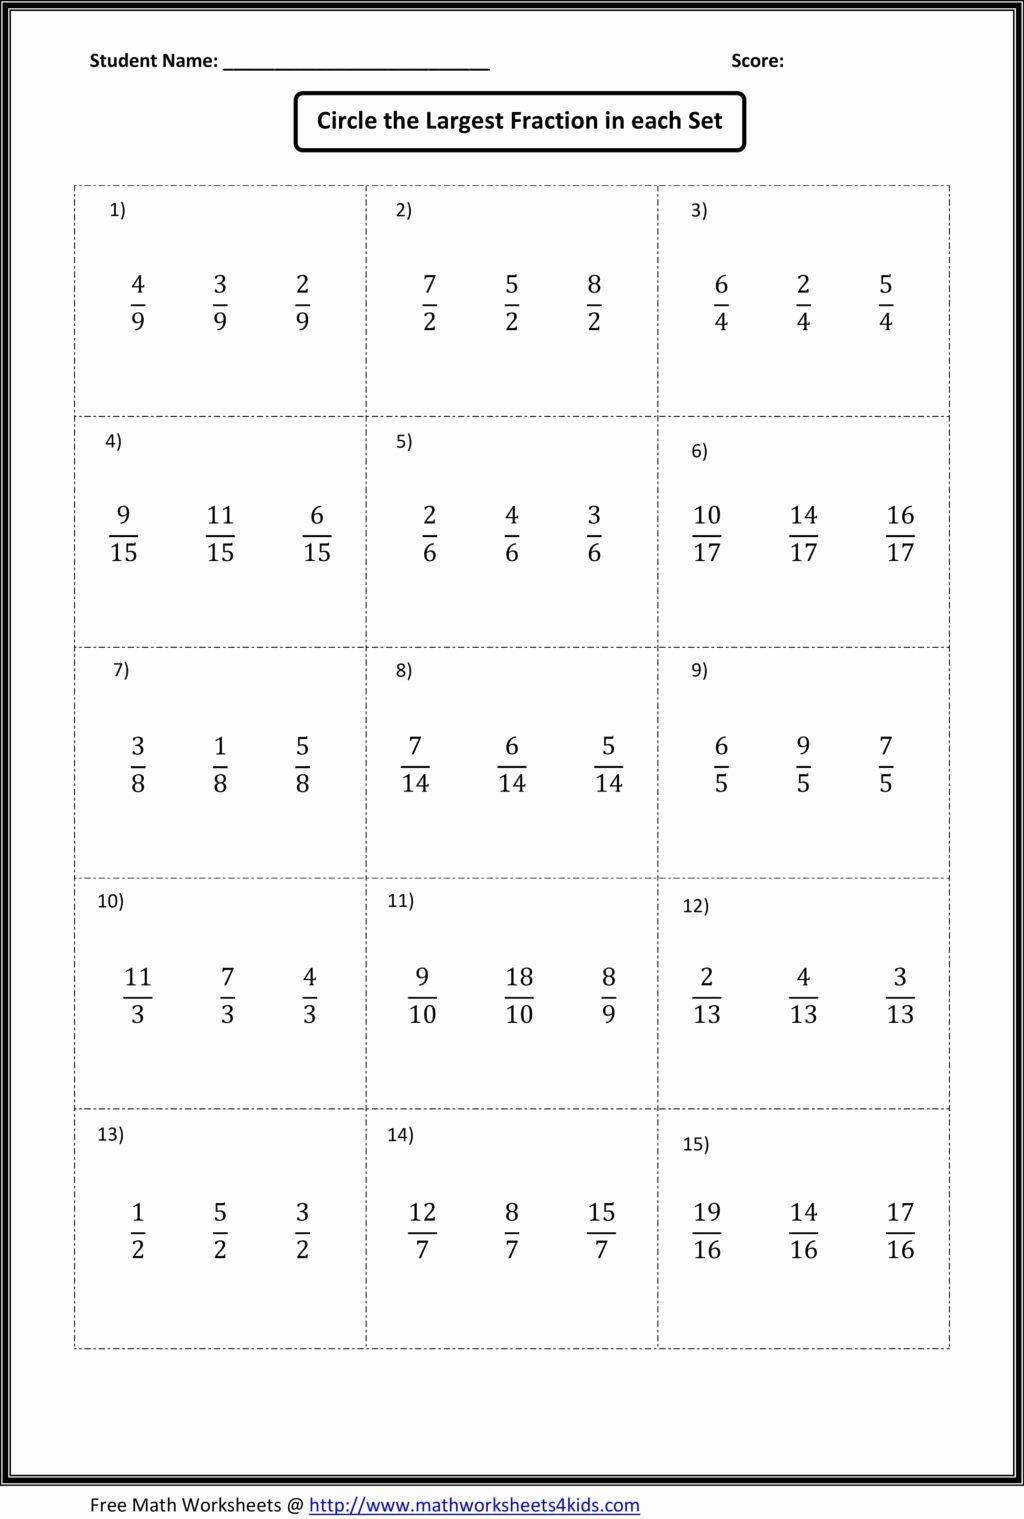 Comparing Fractions Worksheet 4th Grade Fresh Worksheet Worksheet Paring Fractions Worksheets Find